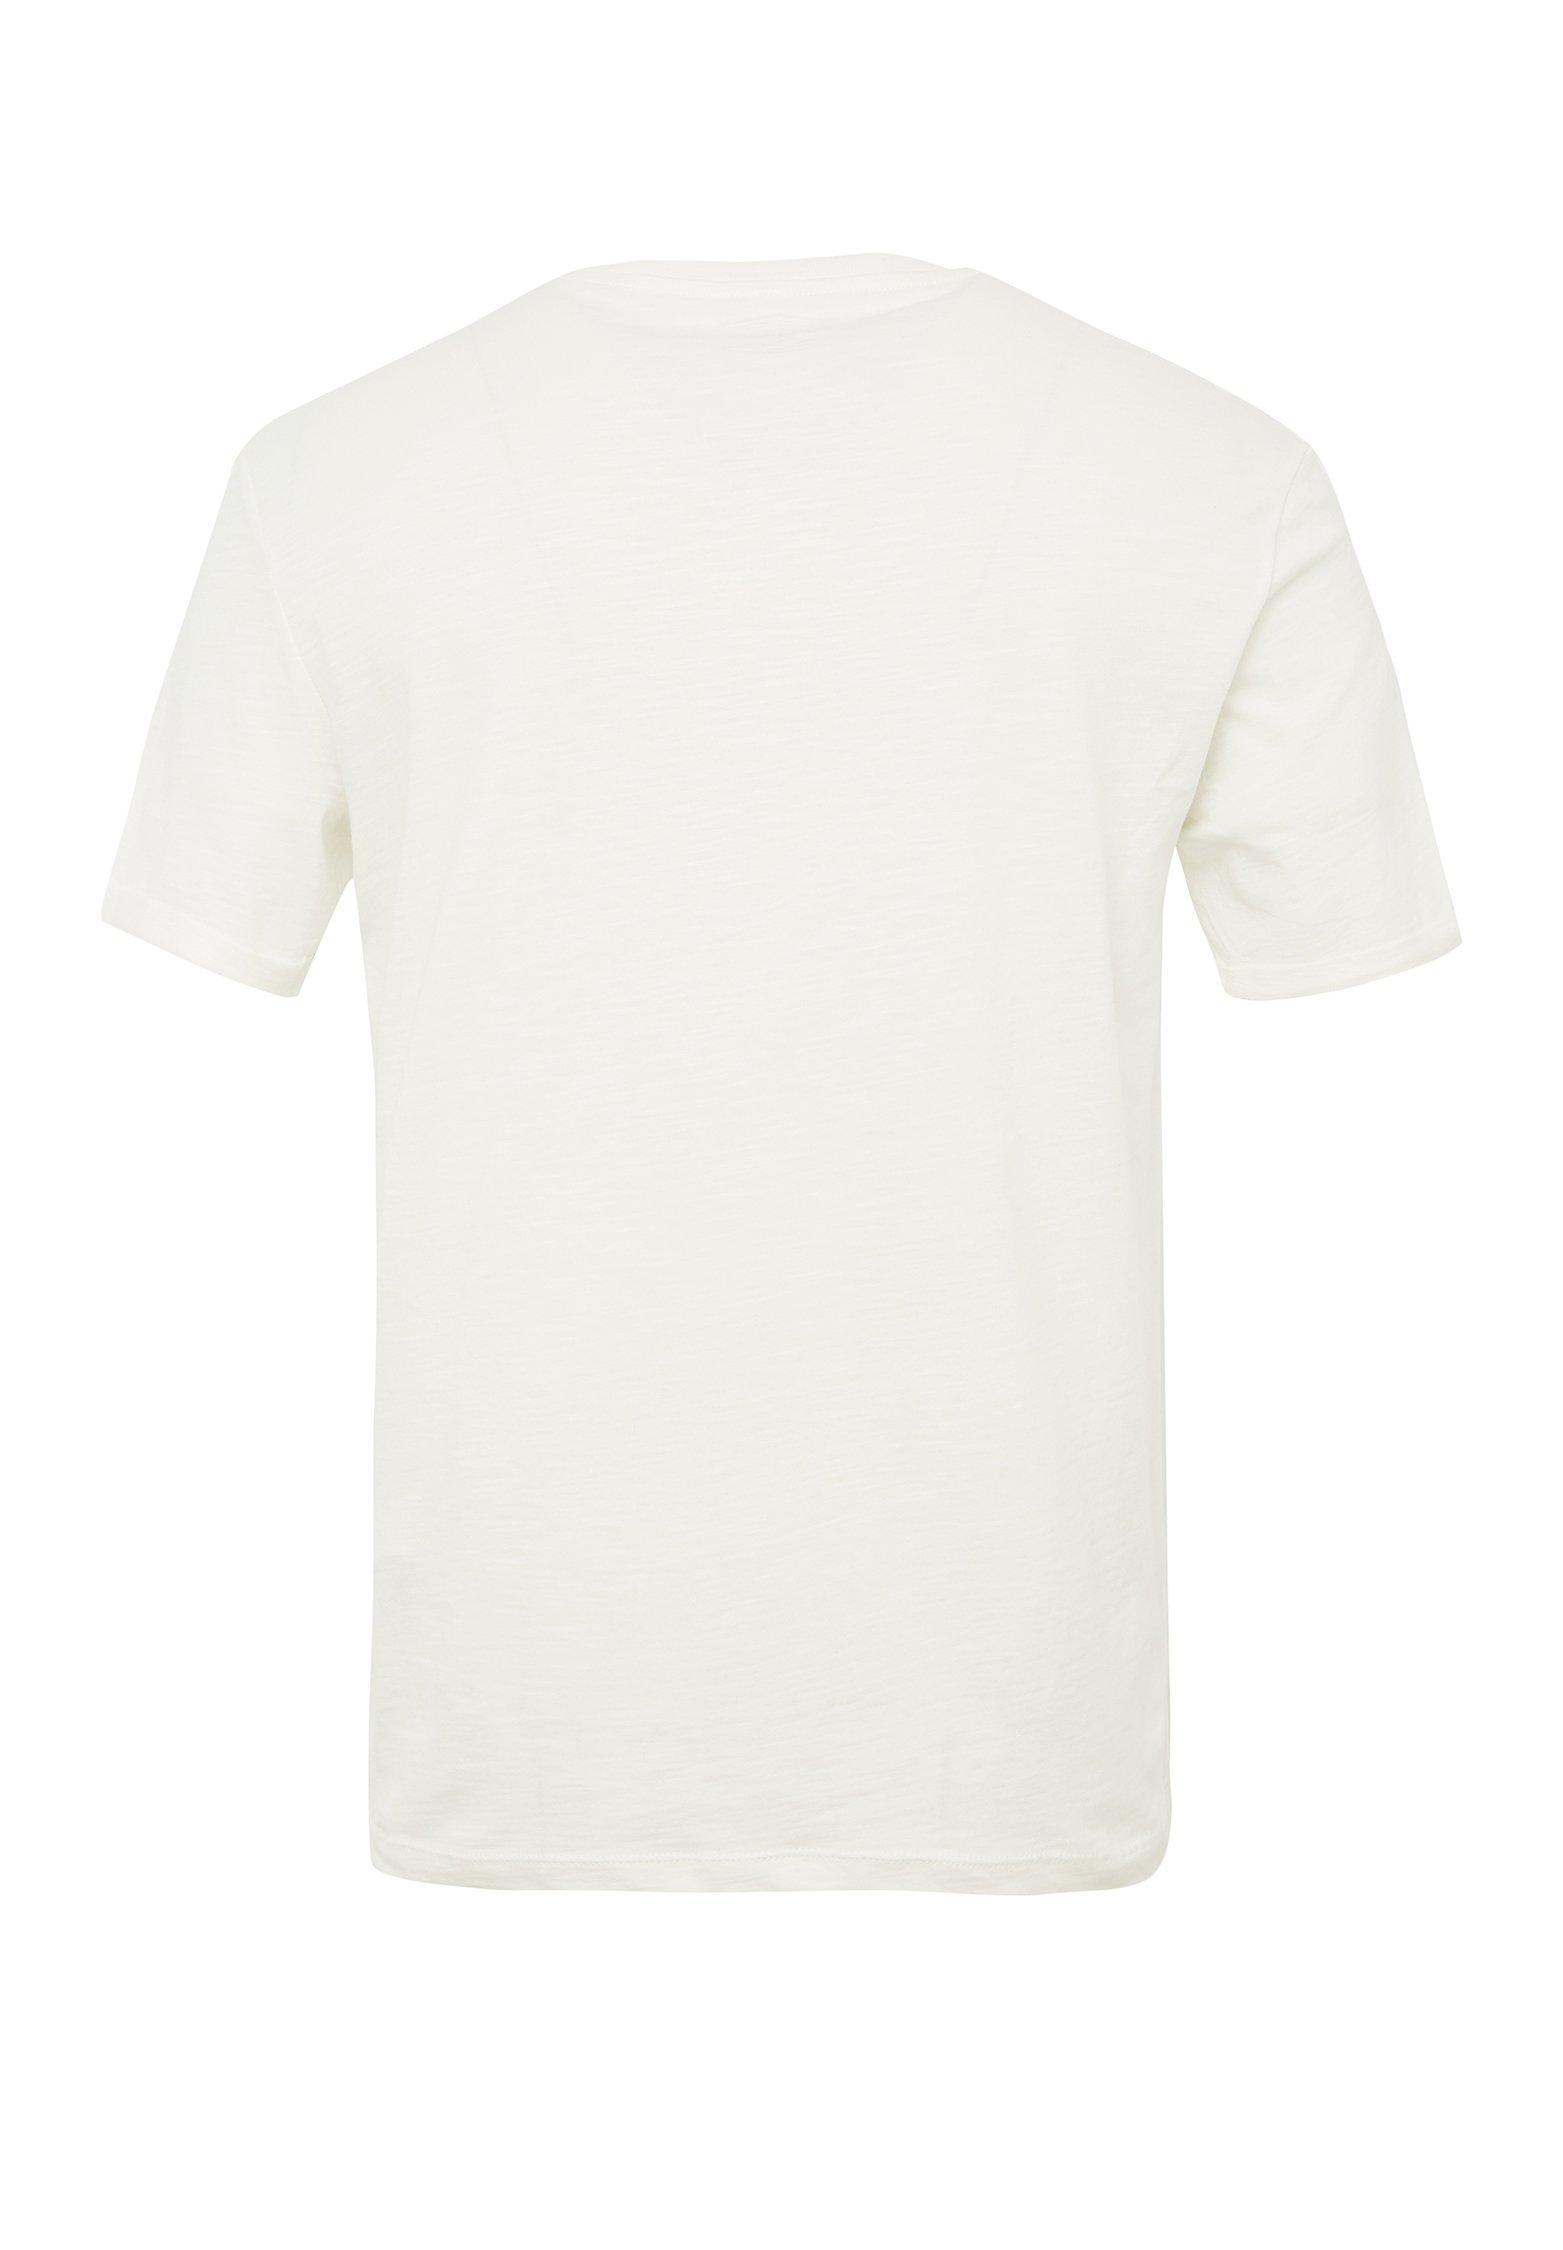 OLYMP Kostymskjorta - marine/royal - Herrkläder 7IzXS